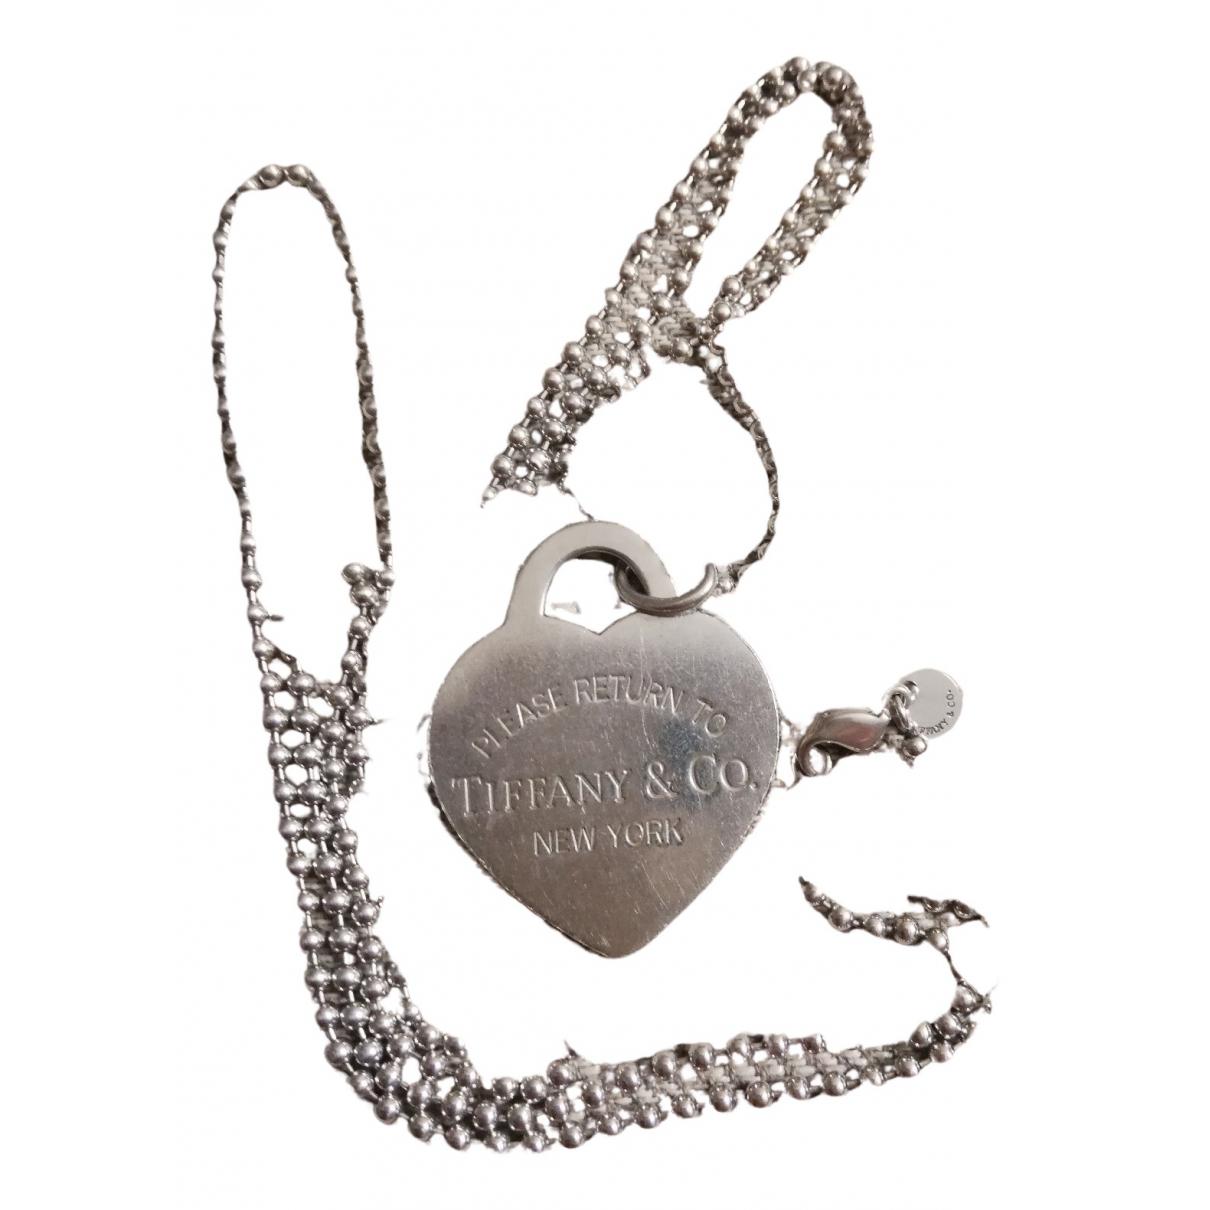 Tiffany & Co Return to Tiffany Halskette in  Silber Silber